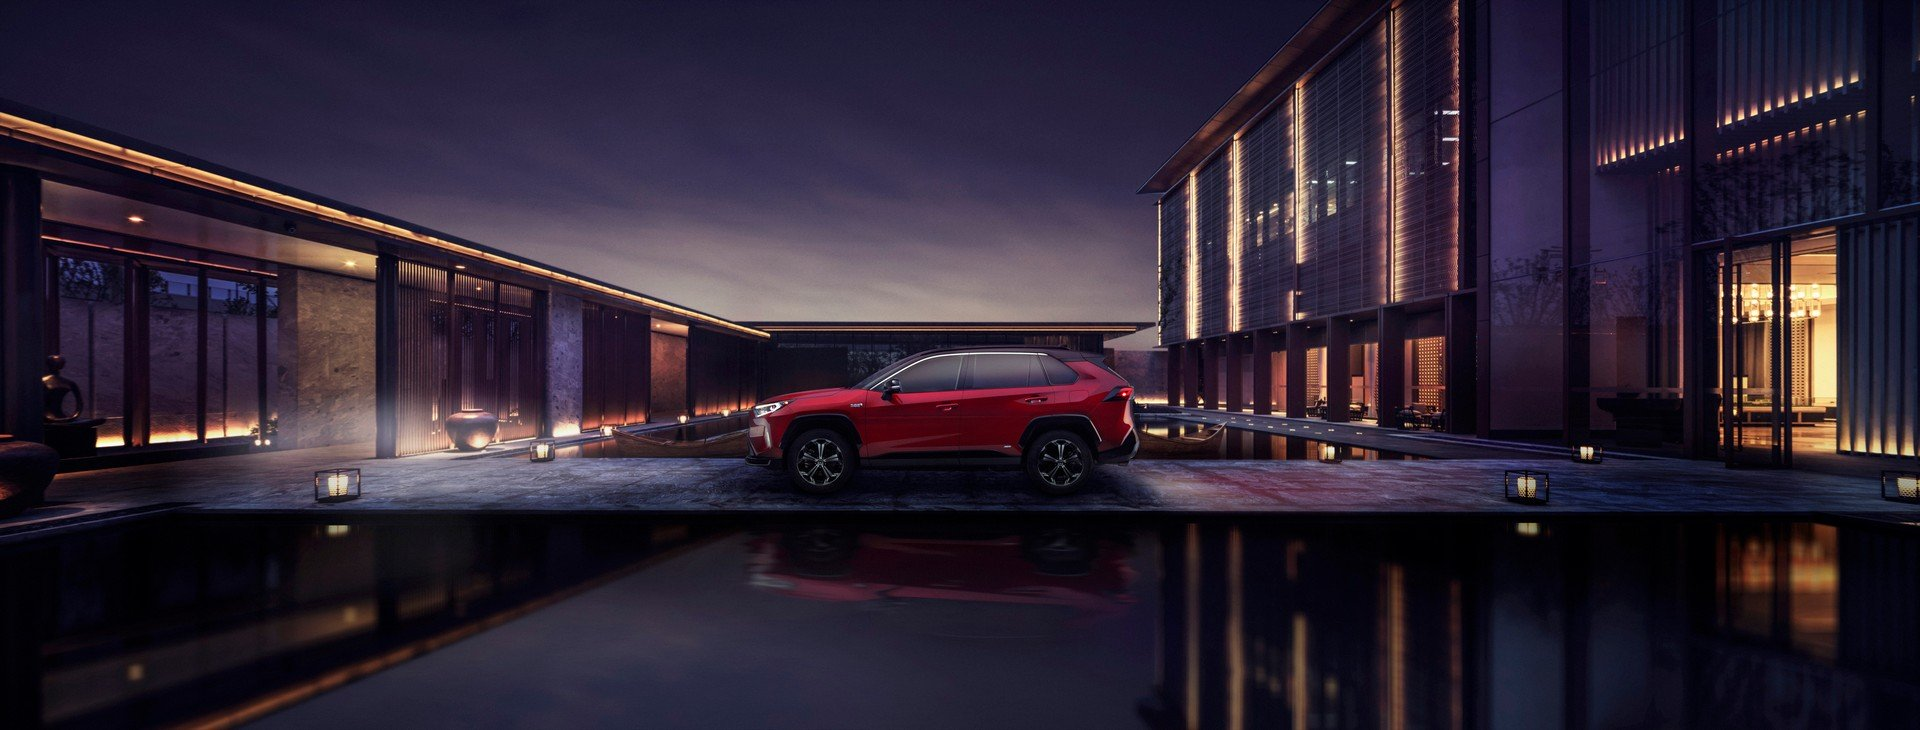 Toyota-RAV4-Plug-in-Hybrid-Prime-2020-9